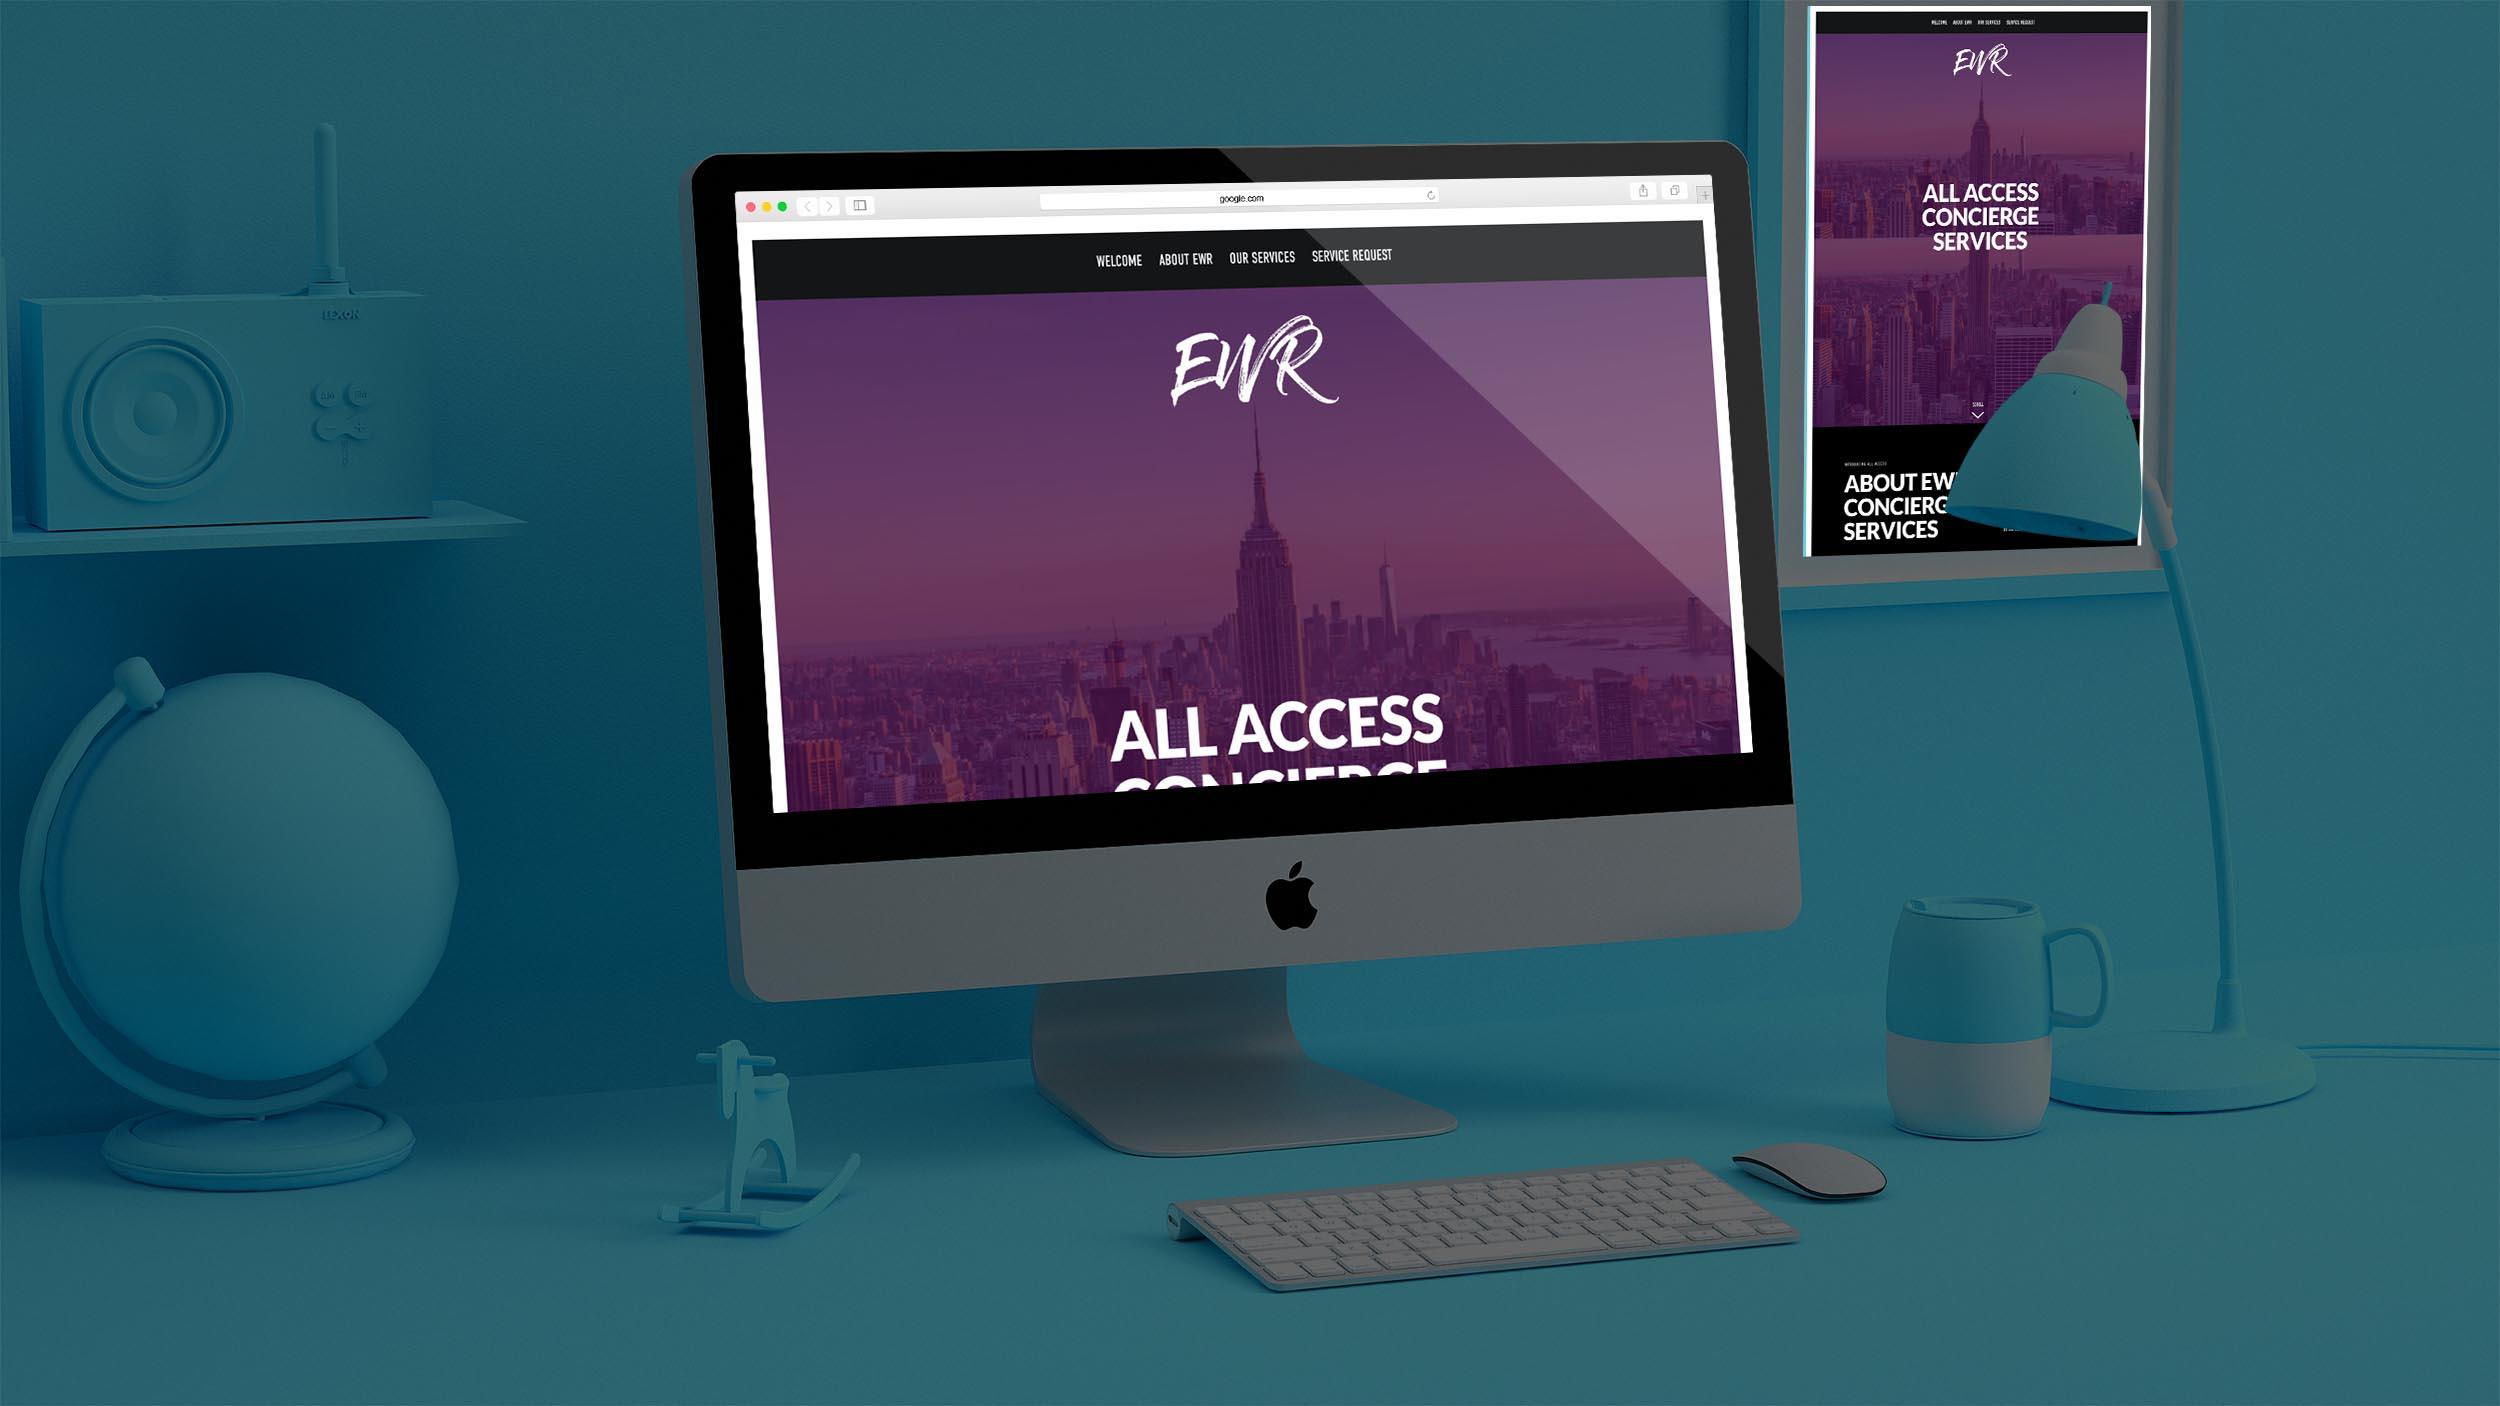 EWR_Website.jpg